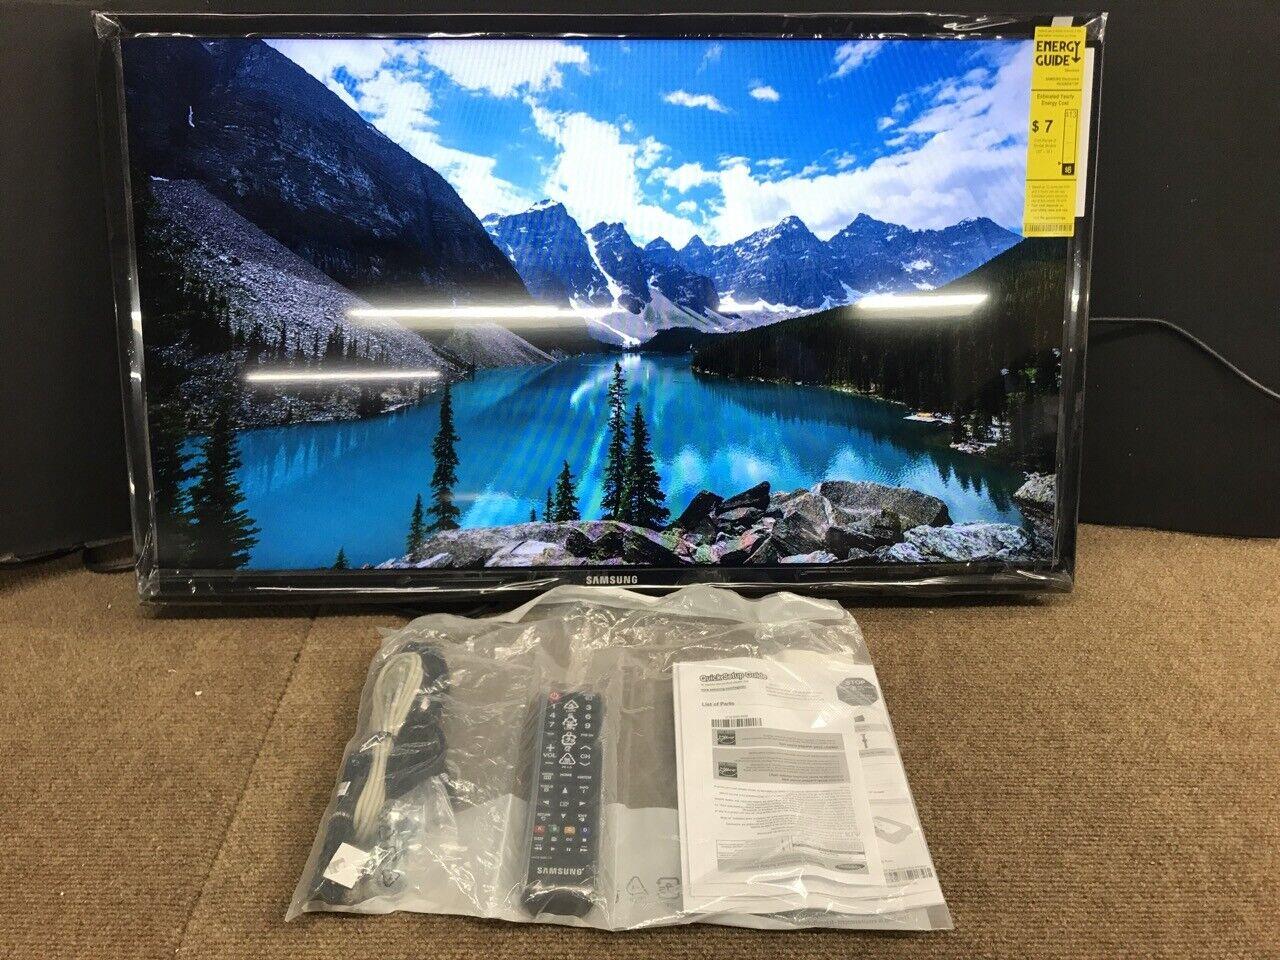 "Samsung ND47DGF 32"" LED LCD Hospitality TV 720p HG32ND477GFXZA ✅❤️️✅❤️️✅ NEW"